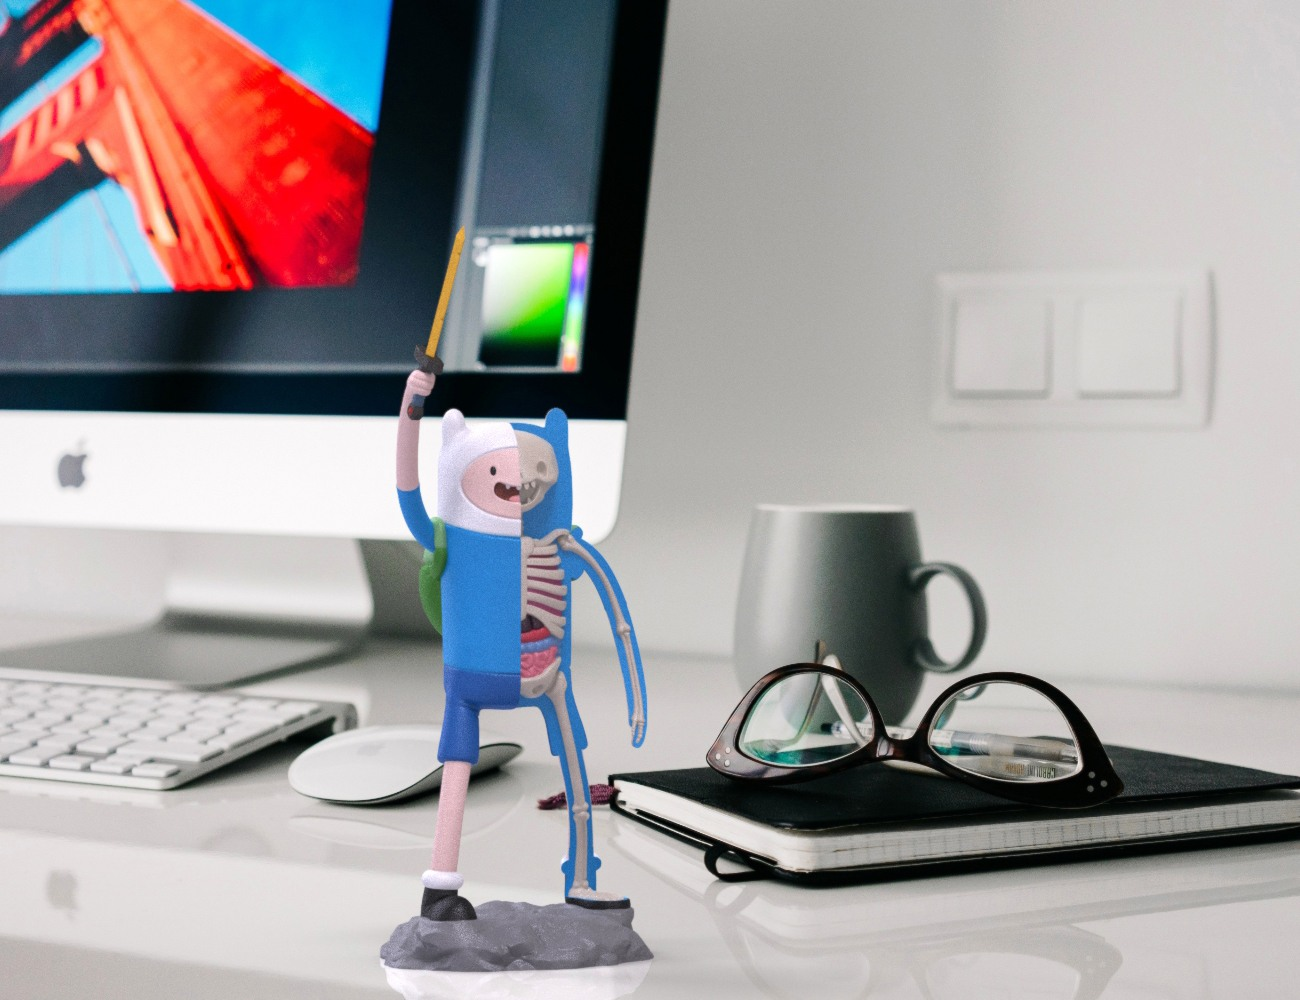 XXRAY Collection Cartoon Figurines